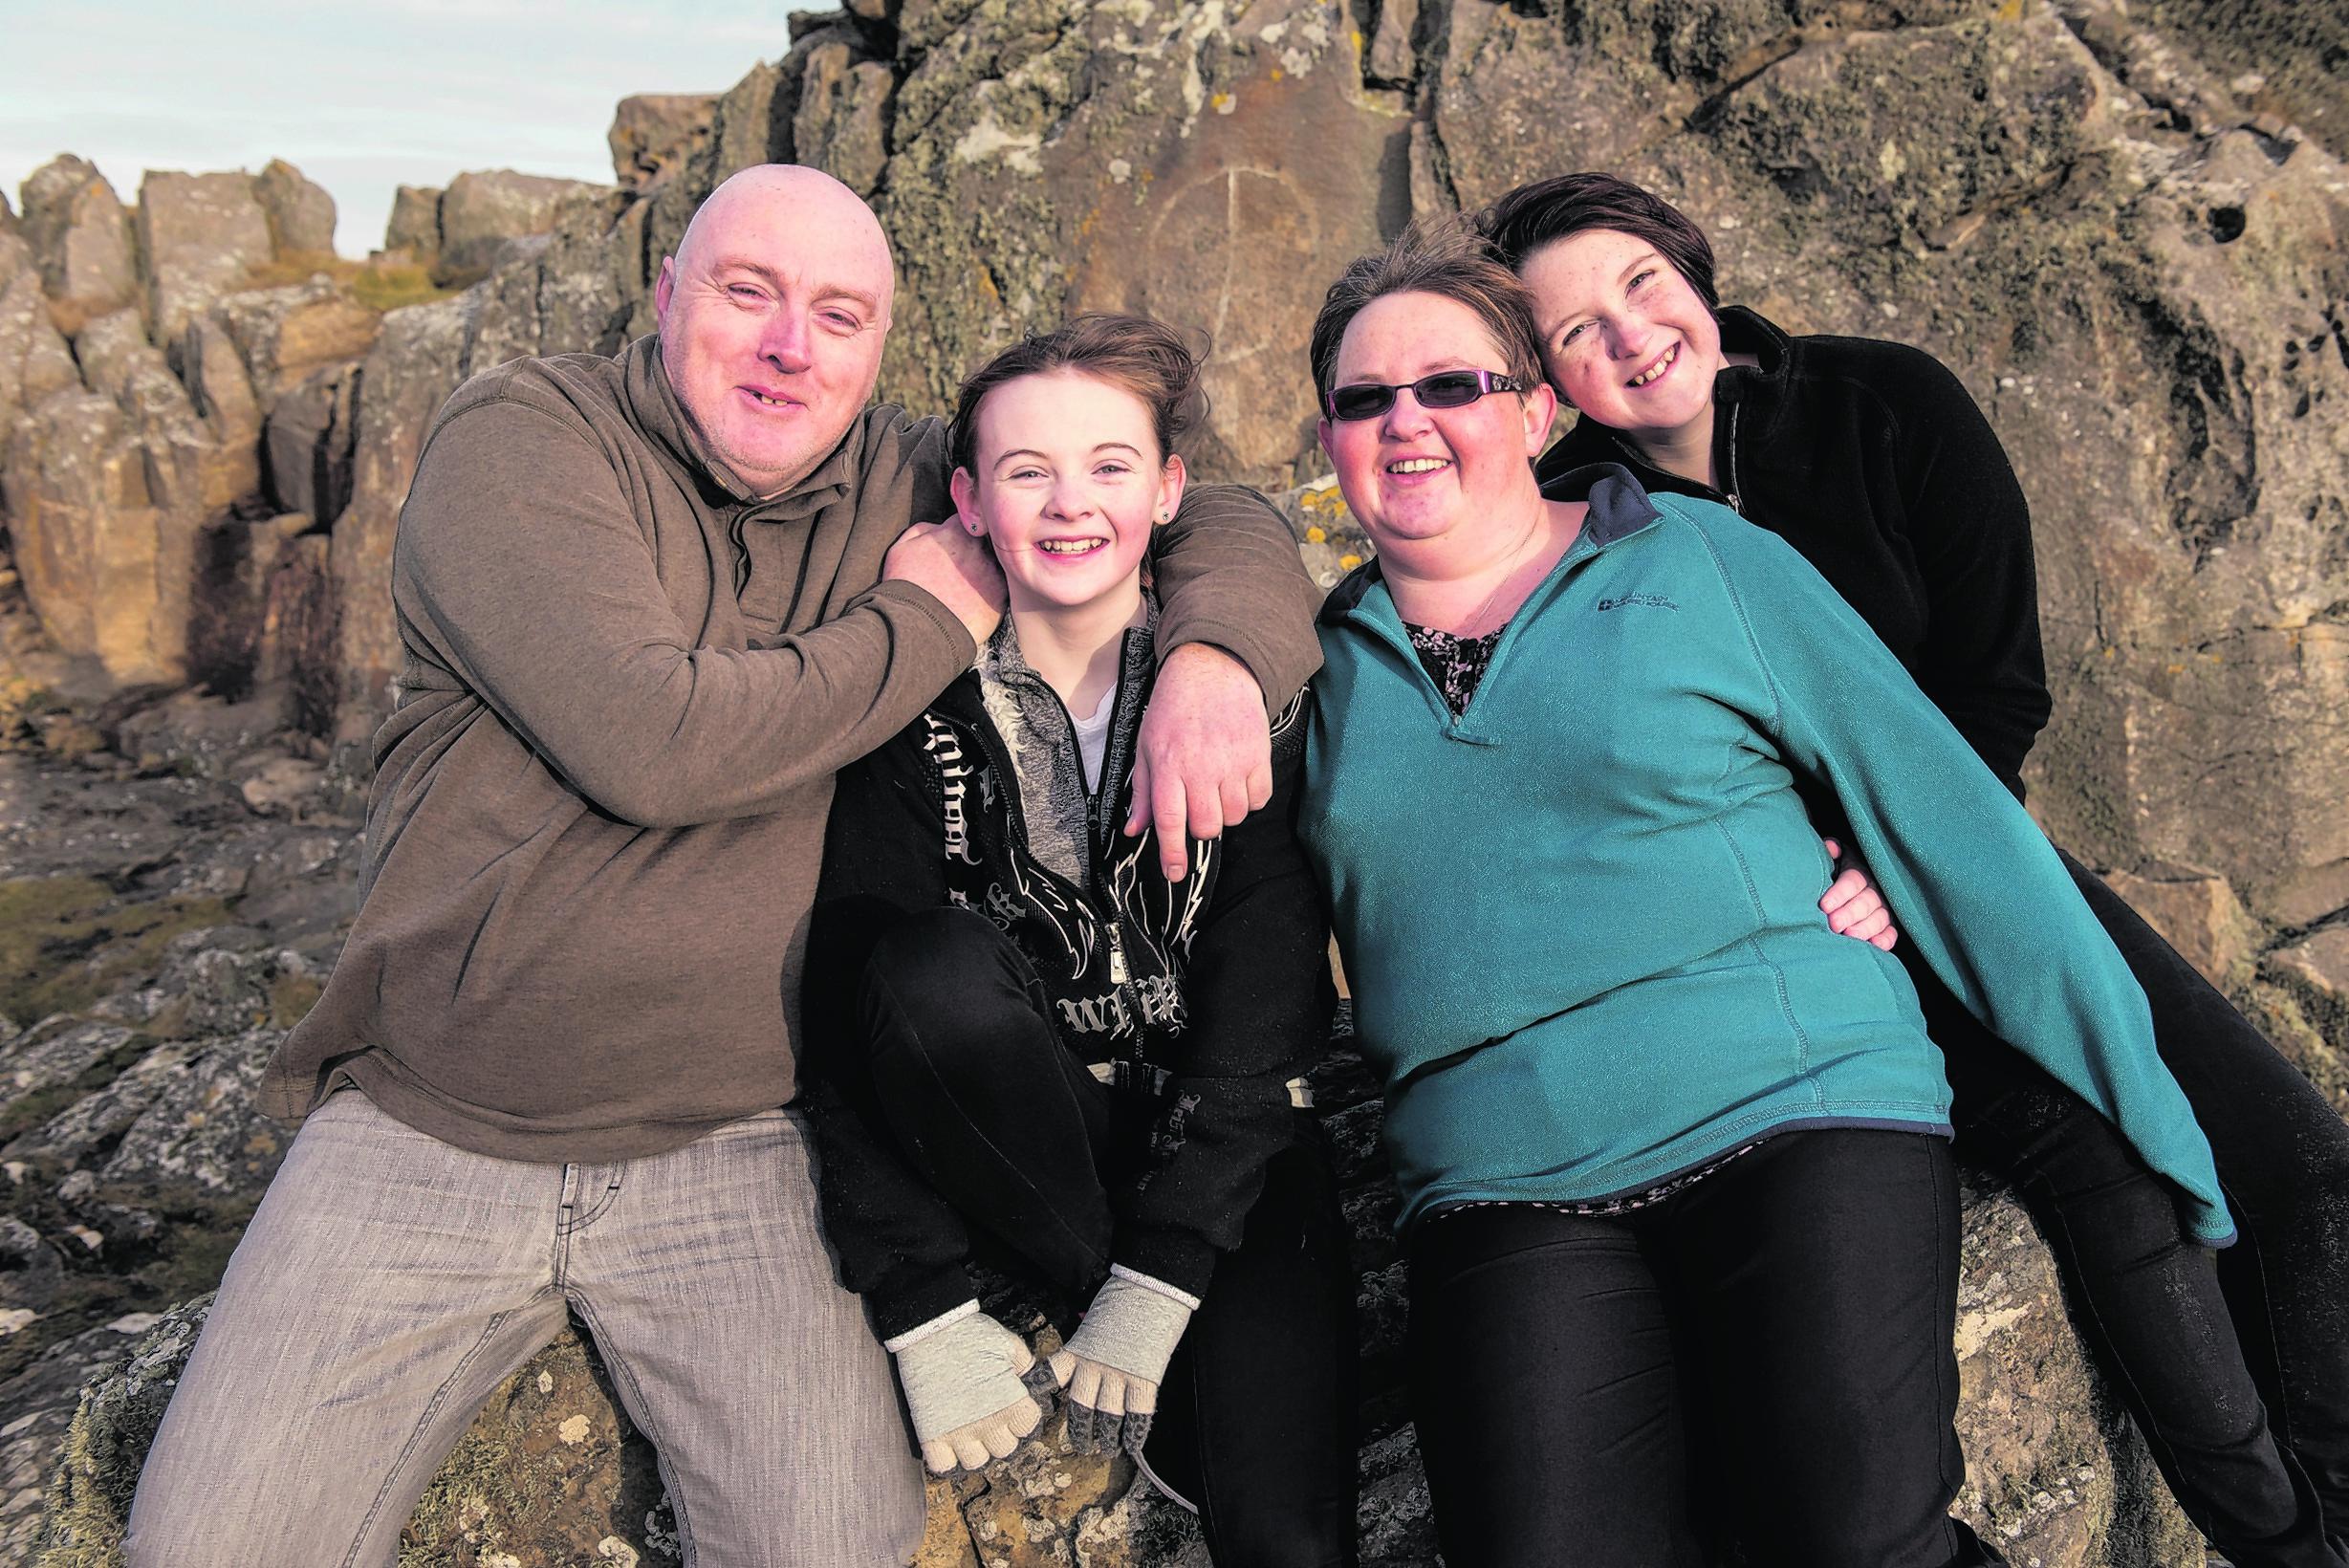 Dad Alex, Laura, Mum Sandie and sister Ally